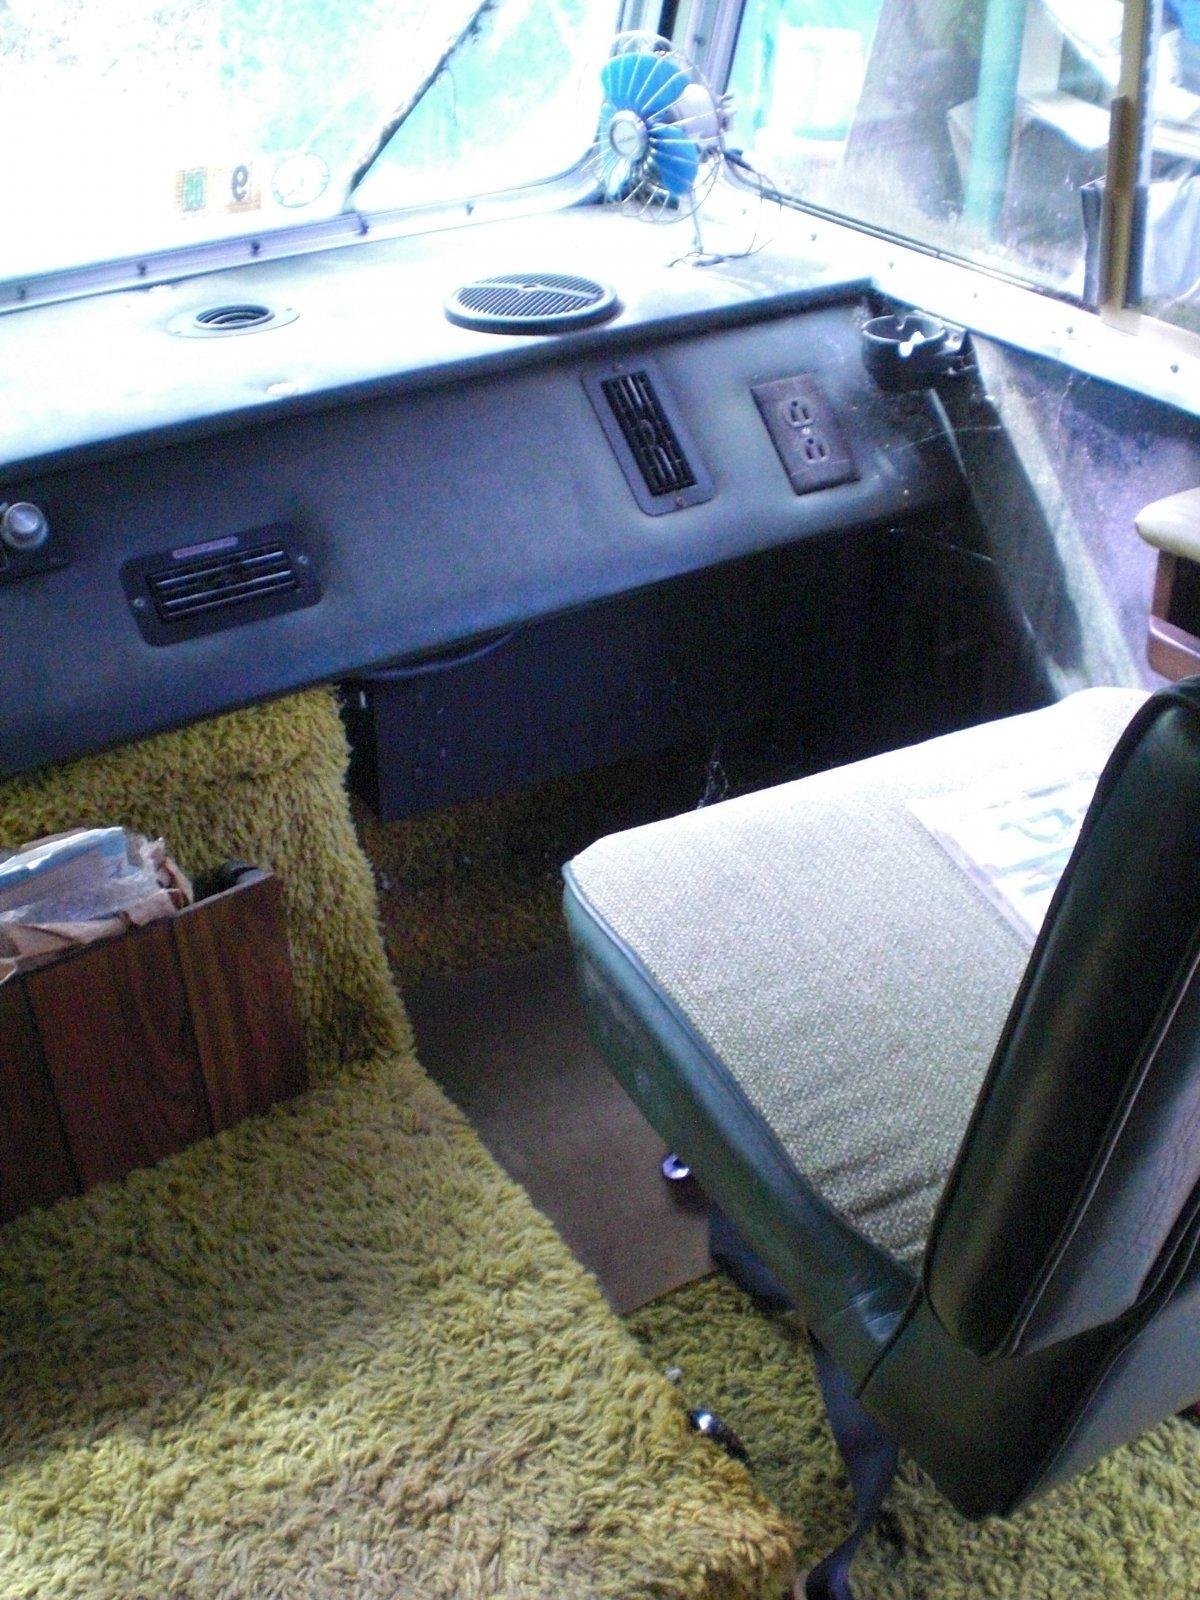 Click image for larger version  Name:passenger seat 2.jpg Views:174 Size:359.3 KB ID:9826